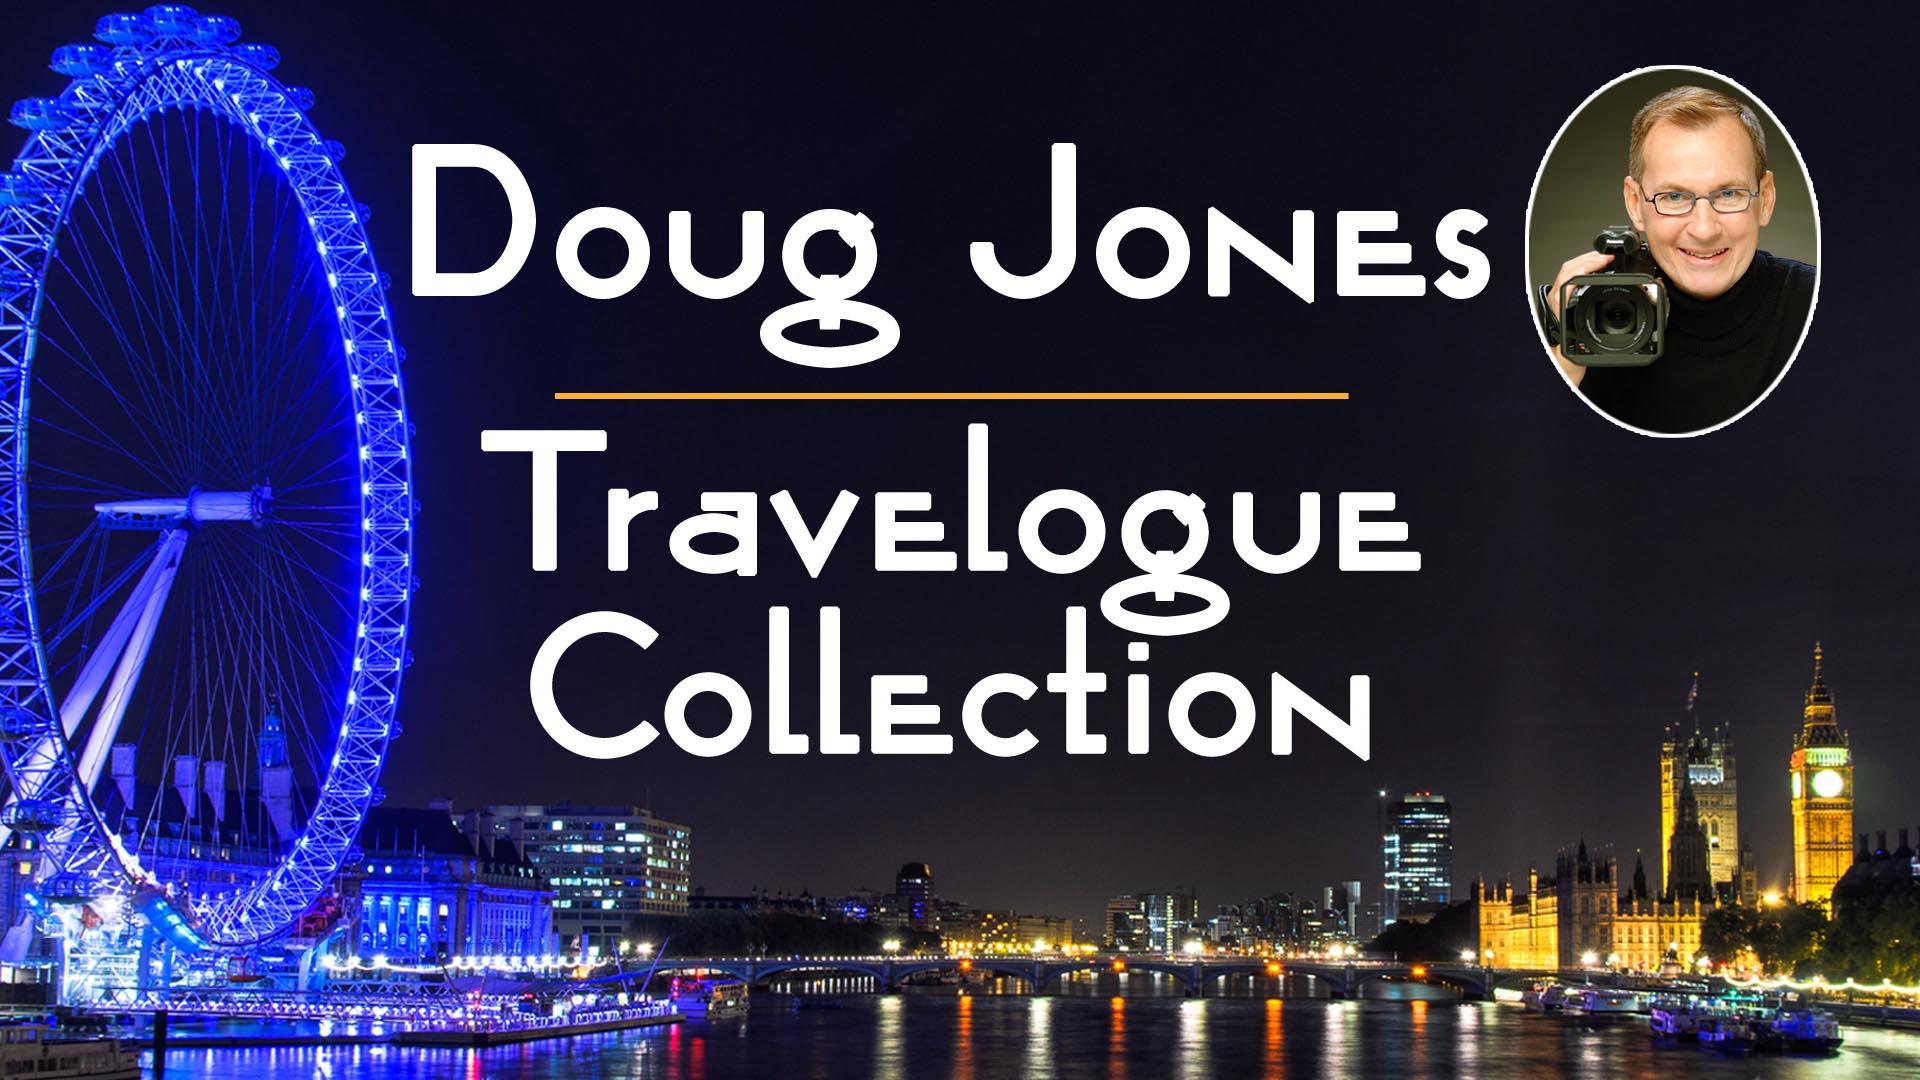 Doug Jones -